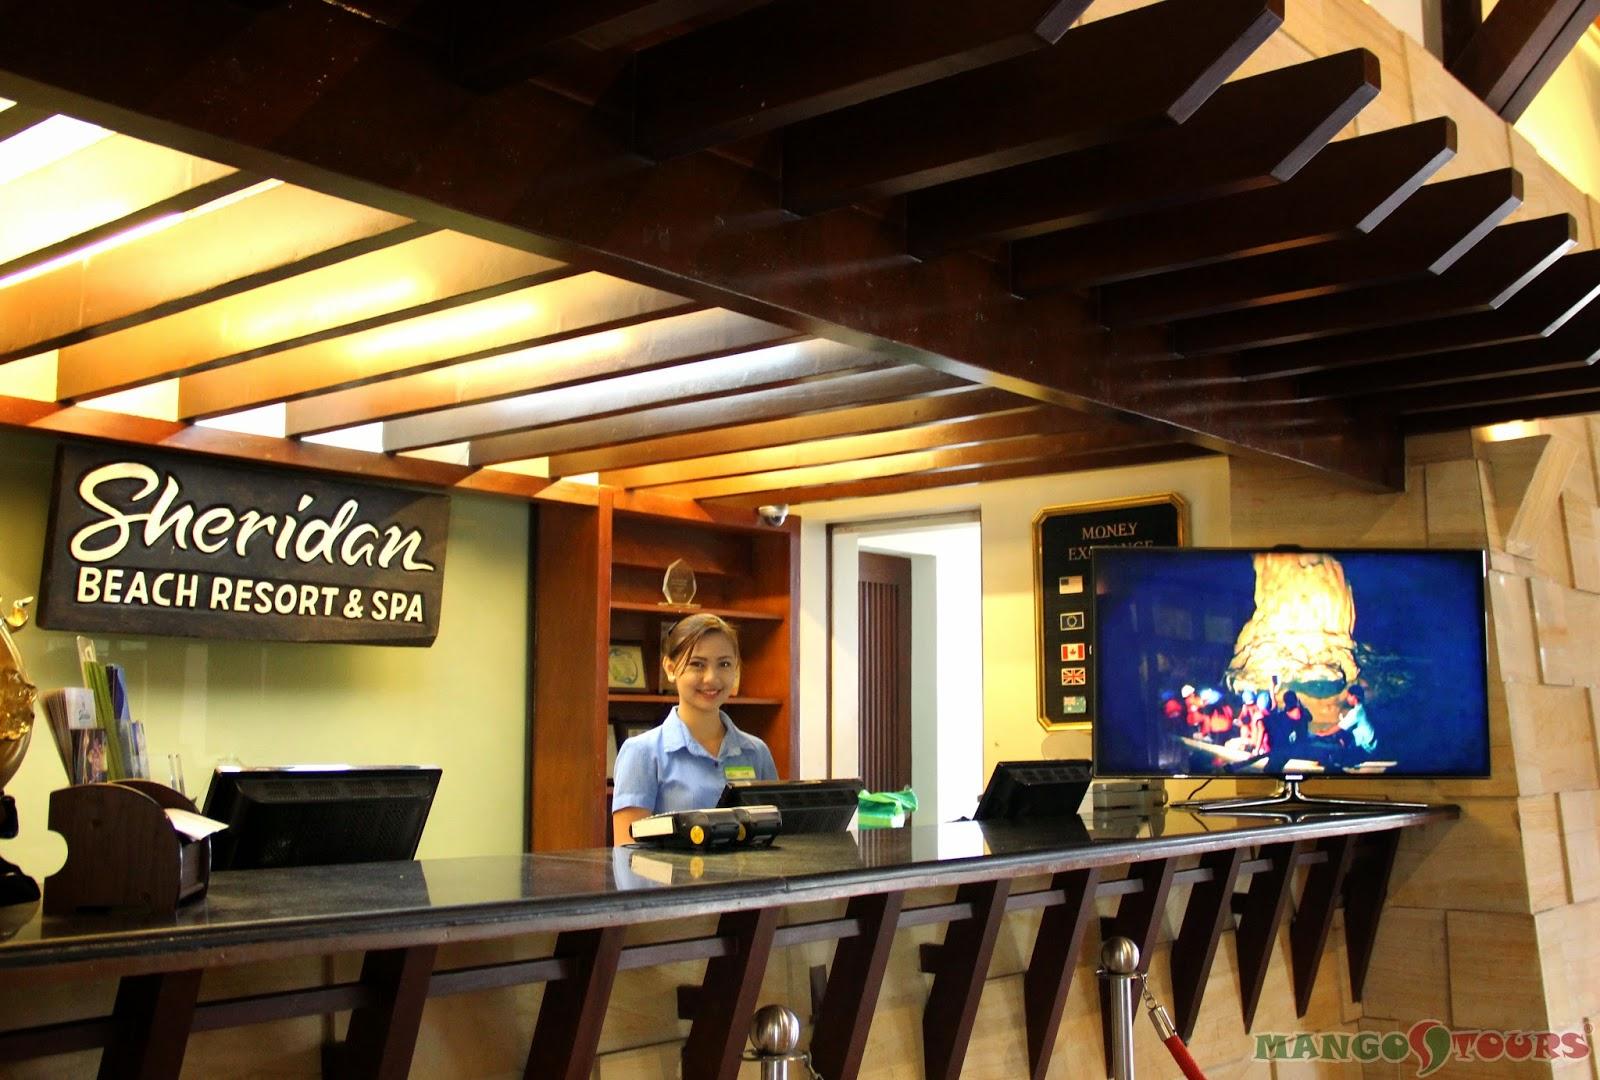 Mango Tours Puerto Princesa Palawan Sheridan Beach Resort & Spa Front Desk Philippines